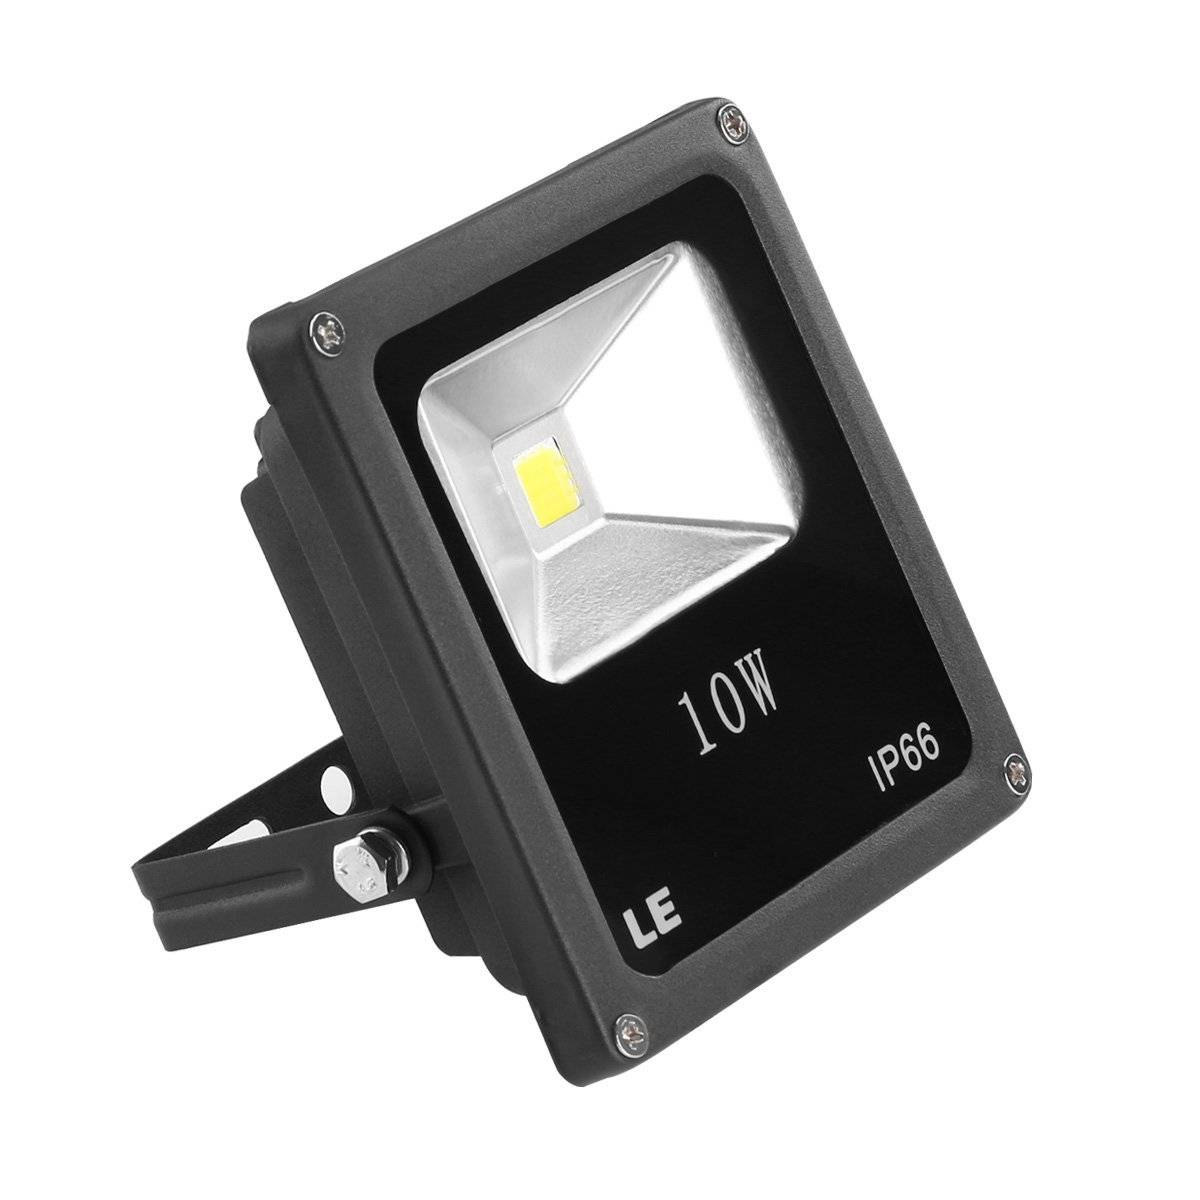 10W Super Bright Outdoor LED Flood Lights, 100W Halogen Bulb Equivalent